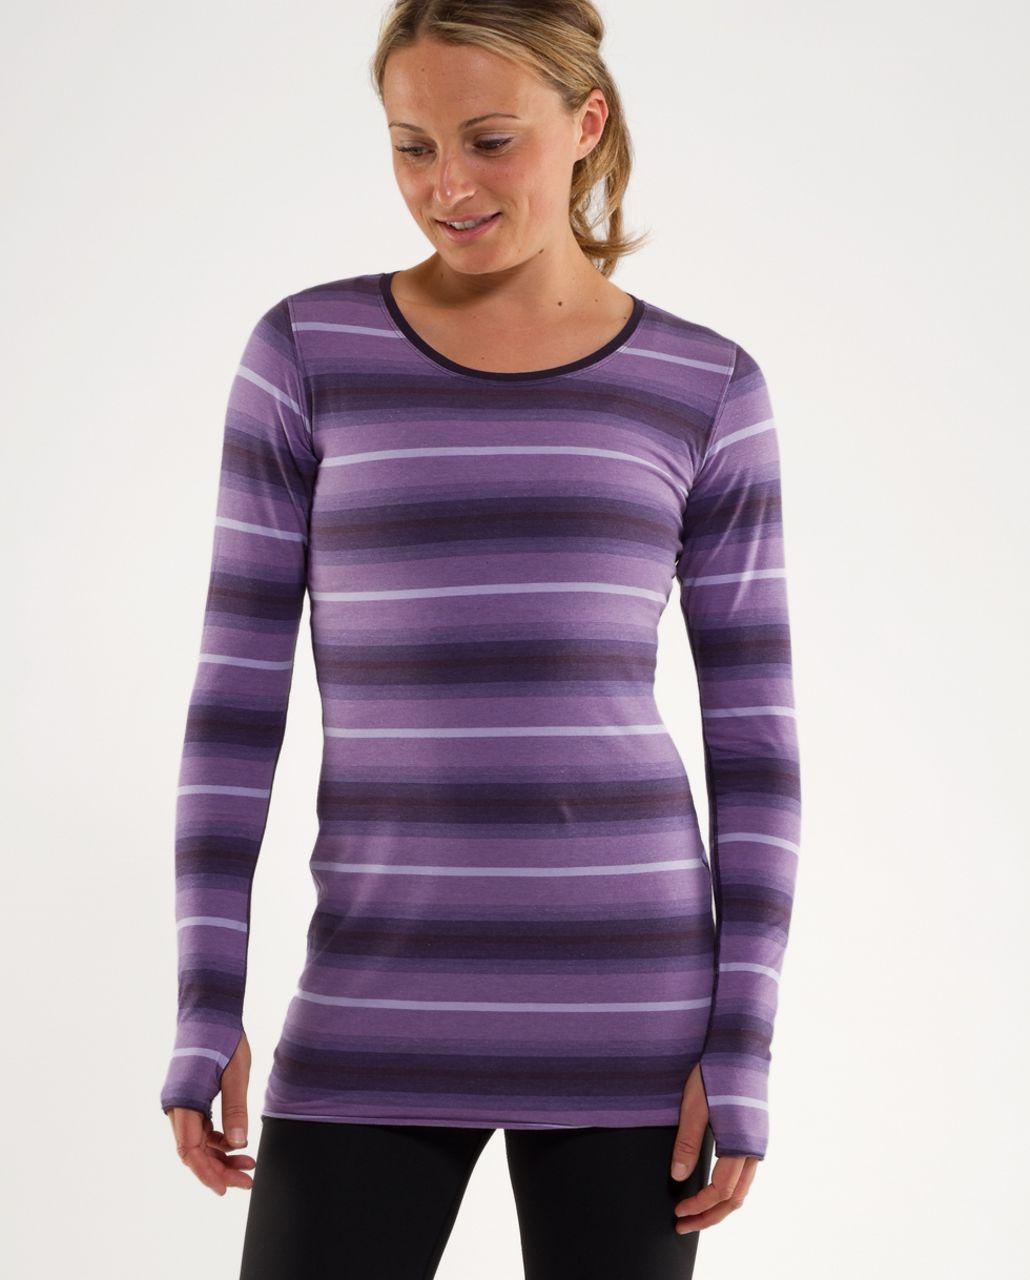 Lululemon Cabin Long Sleeve Tee II - Purples Ombre Stripes /  Black Swan